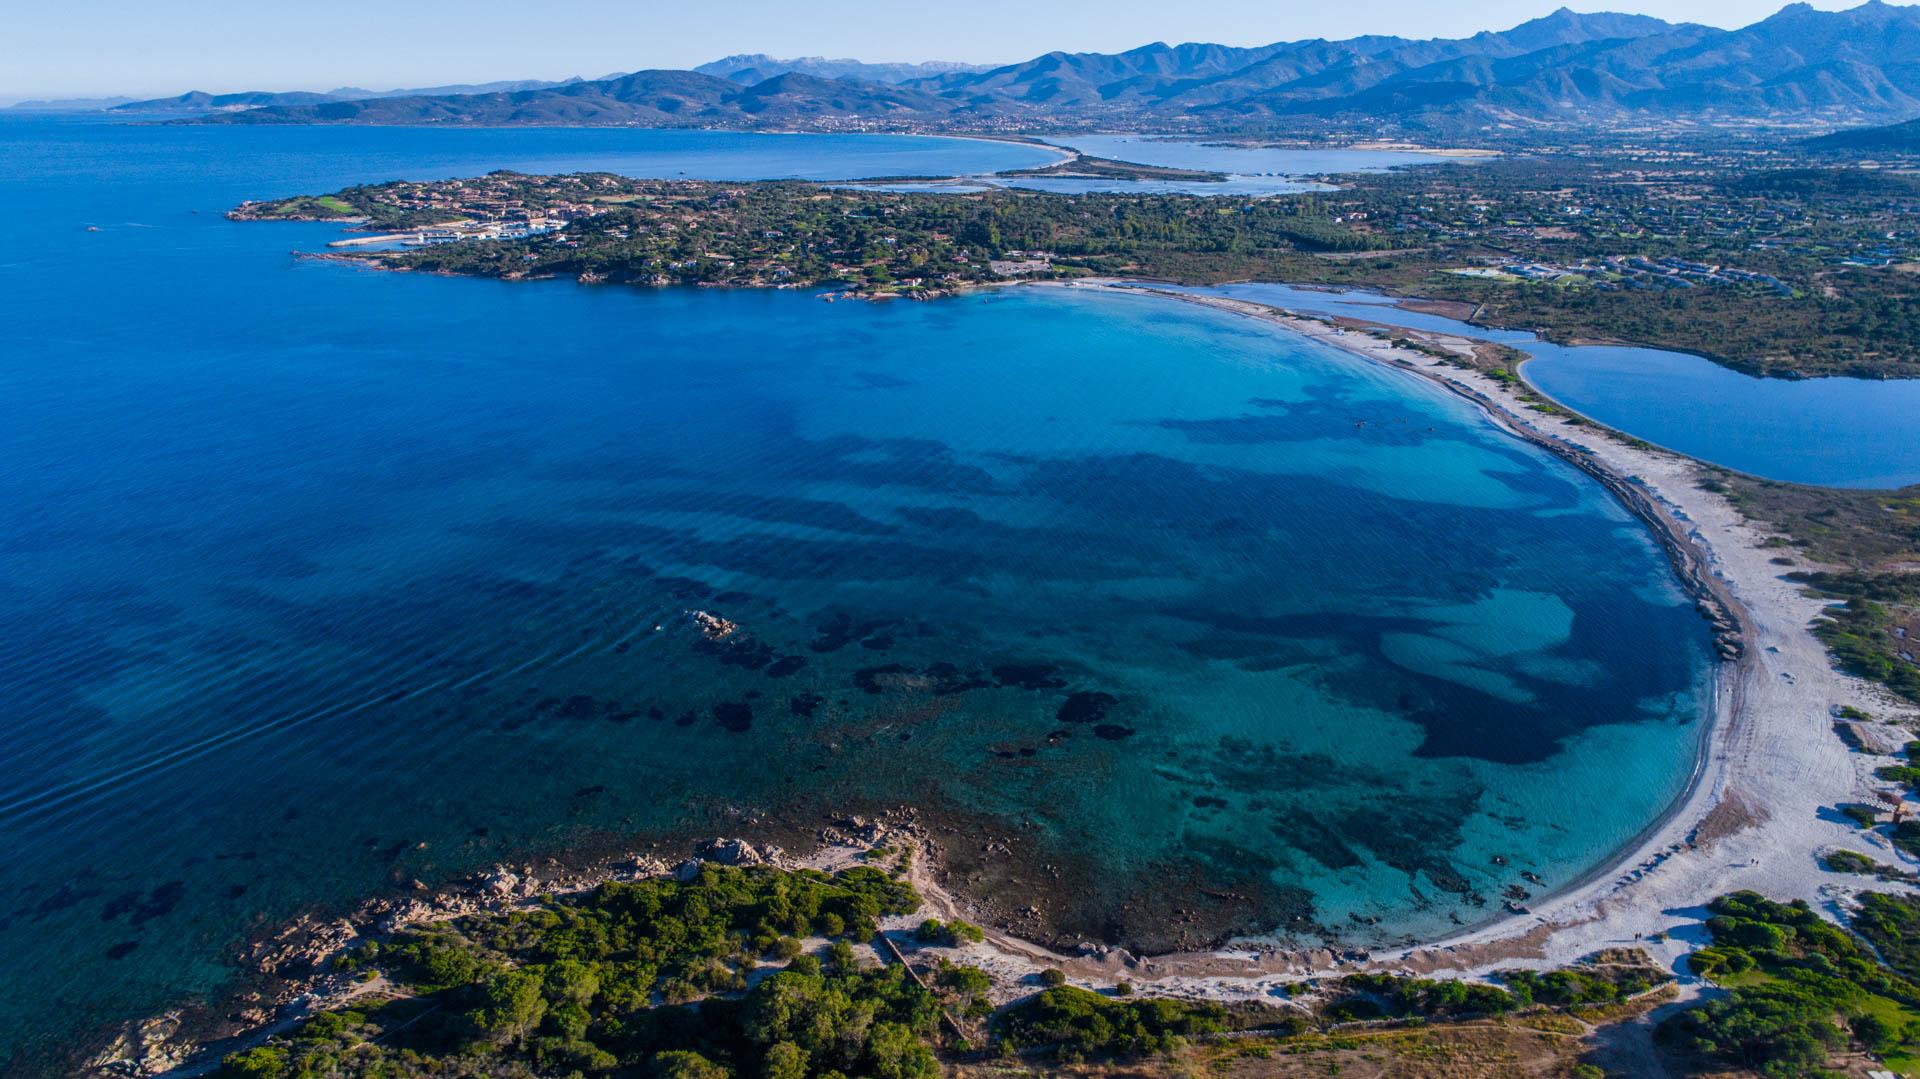 Lu Impostu Sardinia Aerial Photography drone Enrico Pescantini